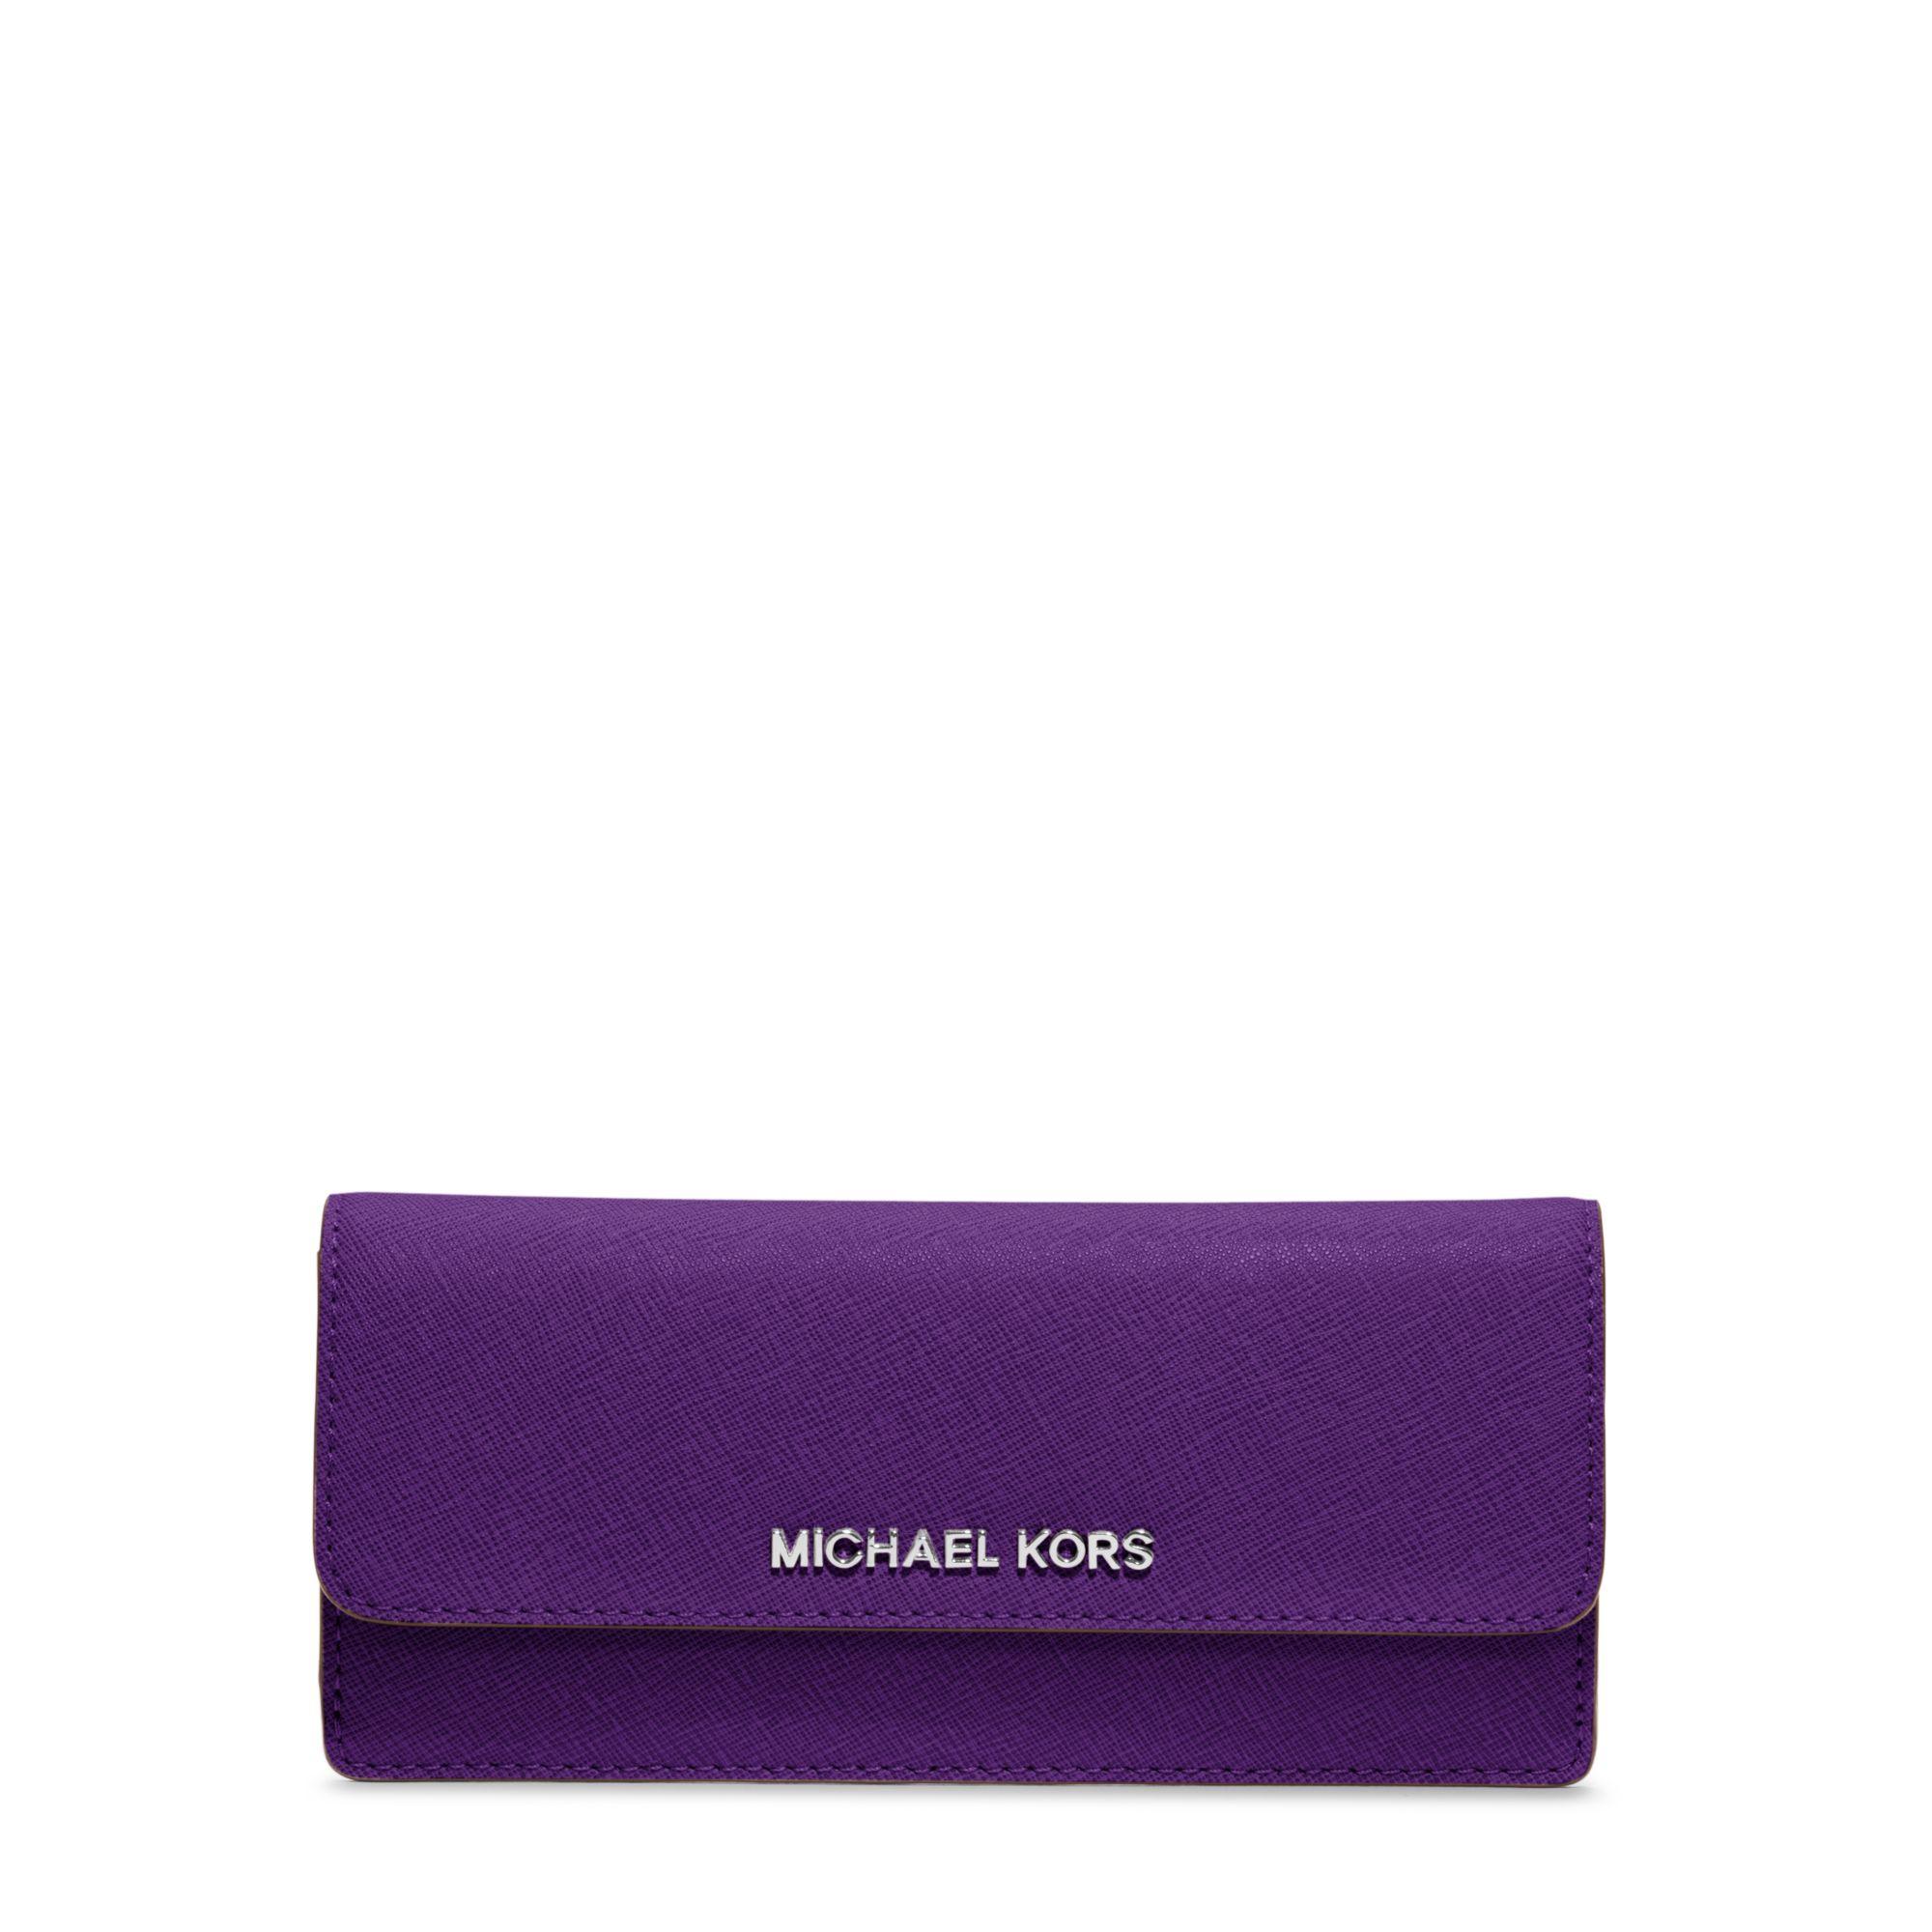 301fd6a0ffd05 Michael Kors Purple Wallet - Best Photo Wallet Justiceforkenny.Org